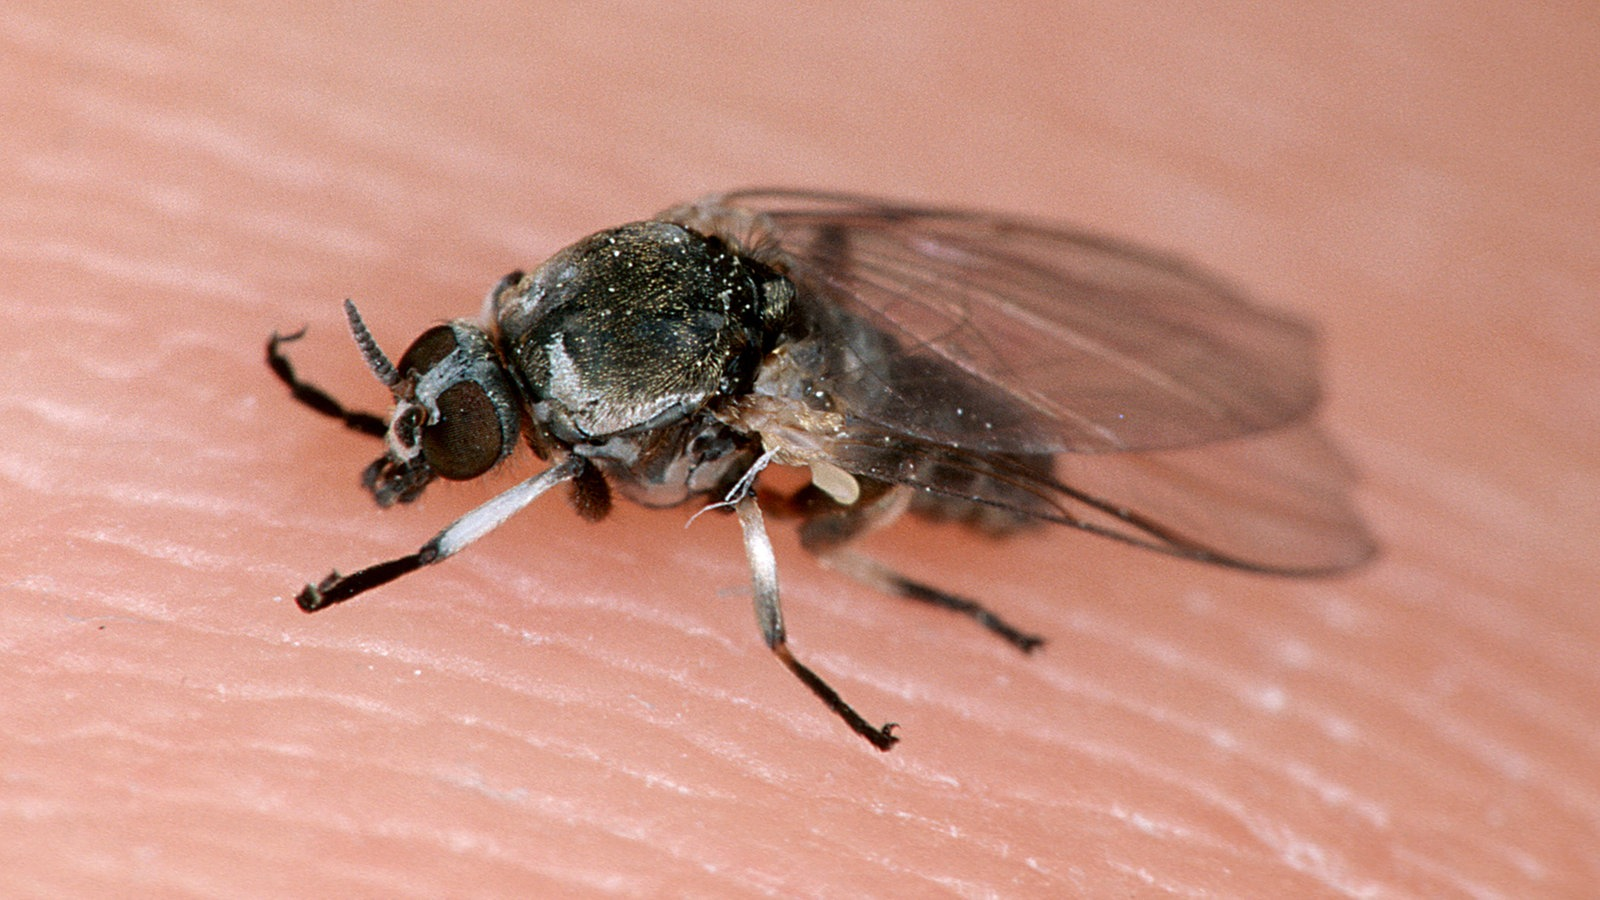 stechm cken blutsaugende insekten stechm cken. Black Bedroom Furniture Sets. Home Design Ideas